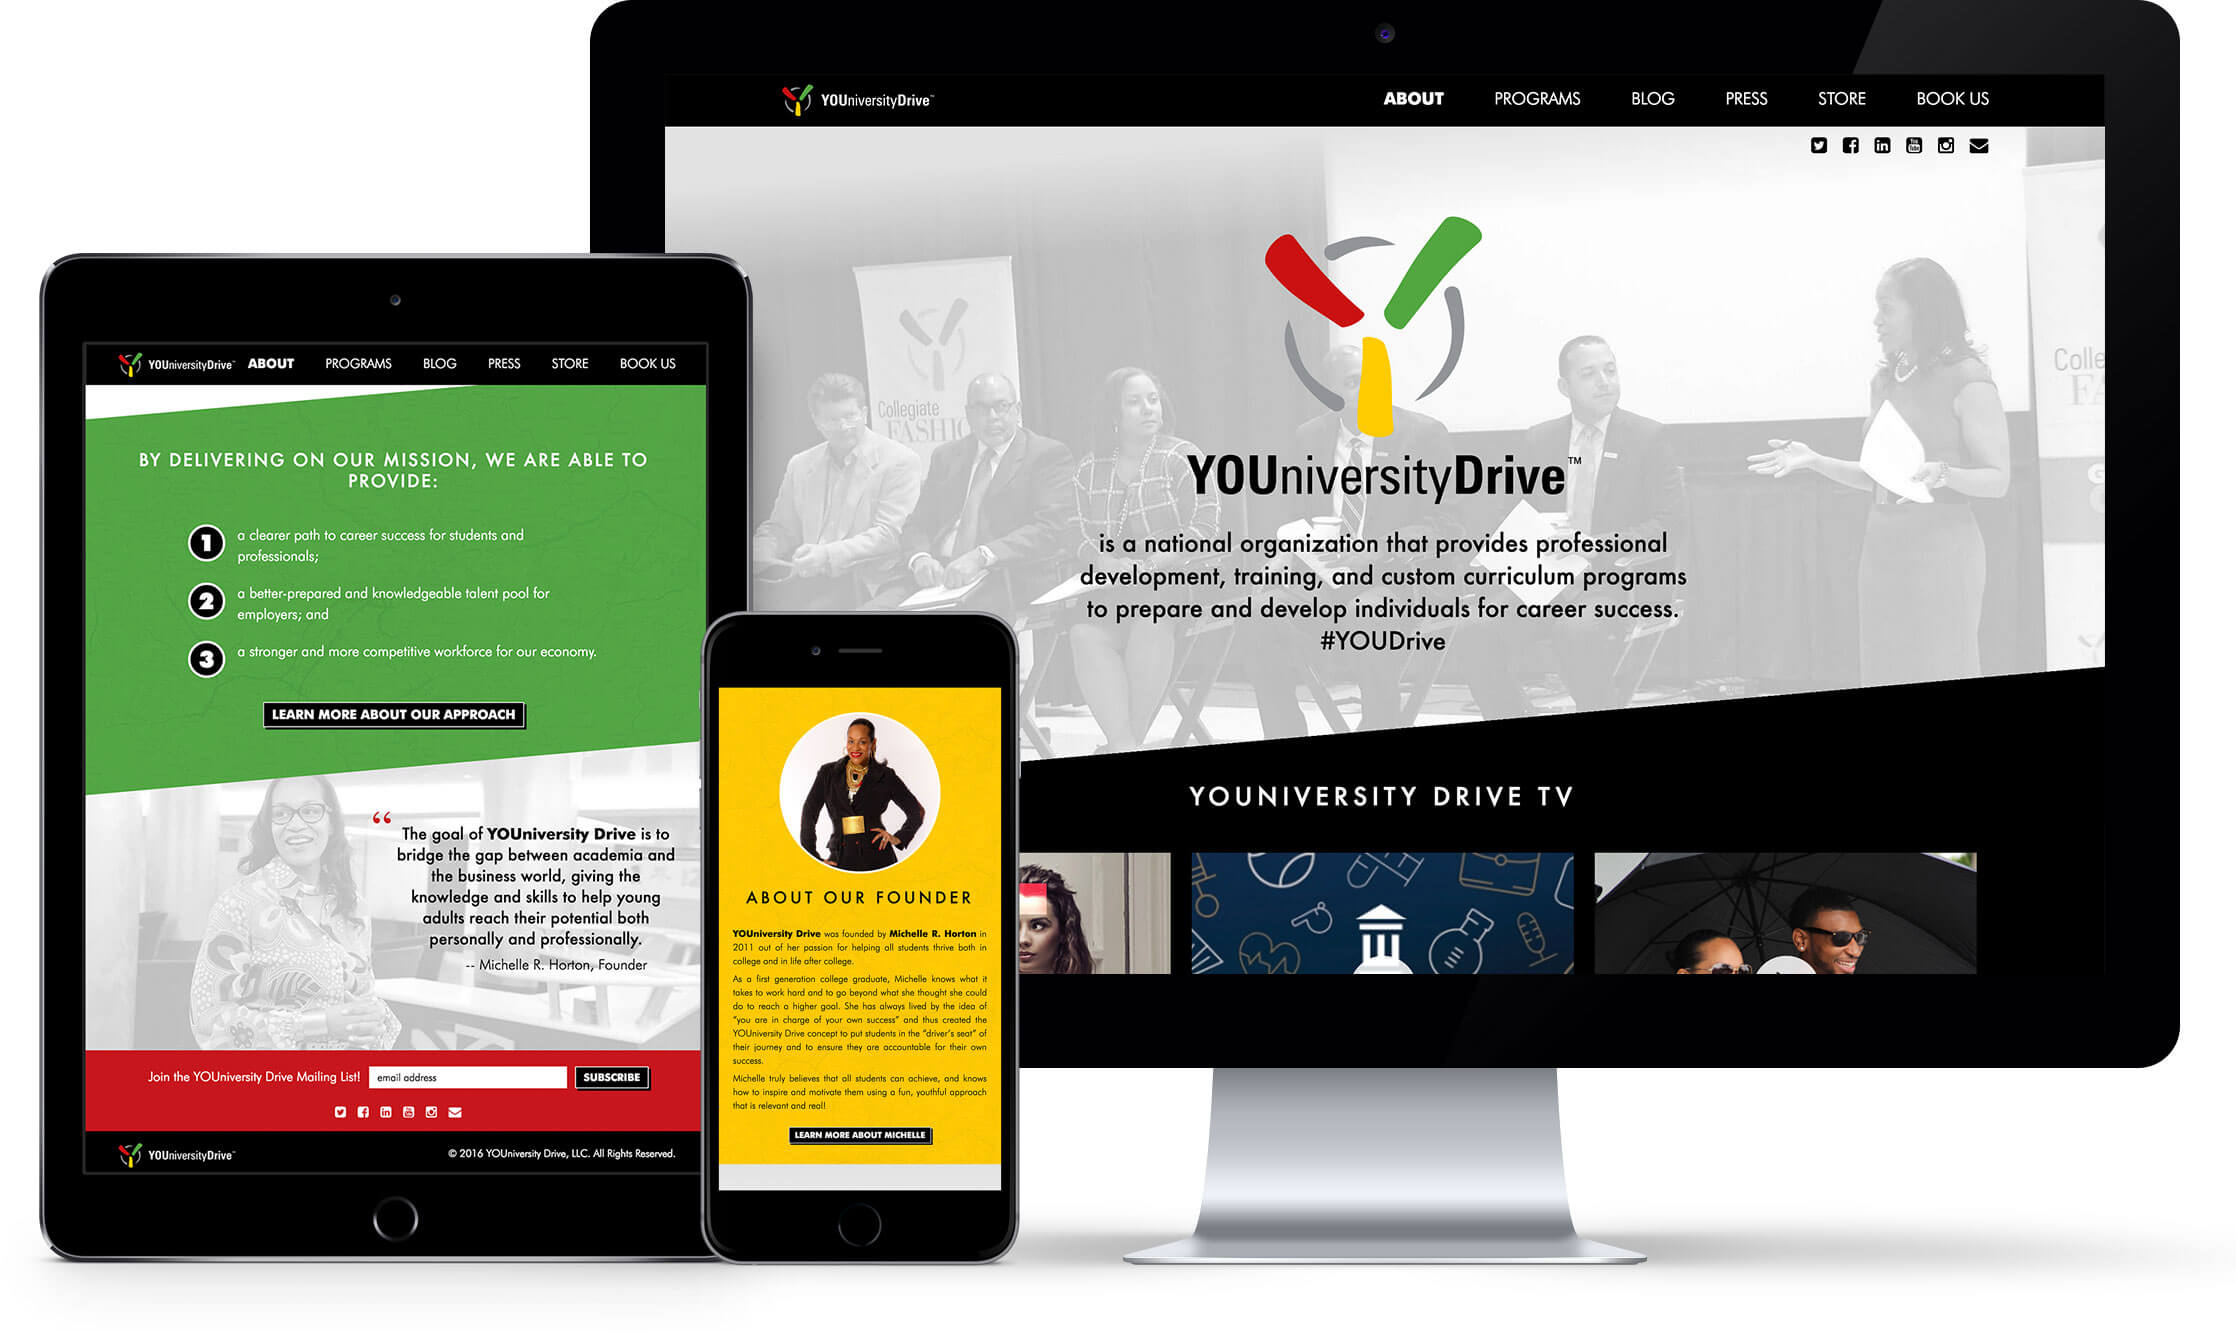 YOUniversity Drive